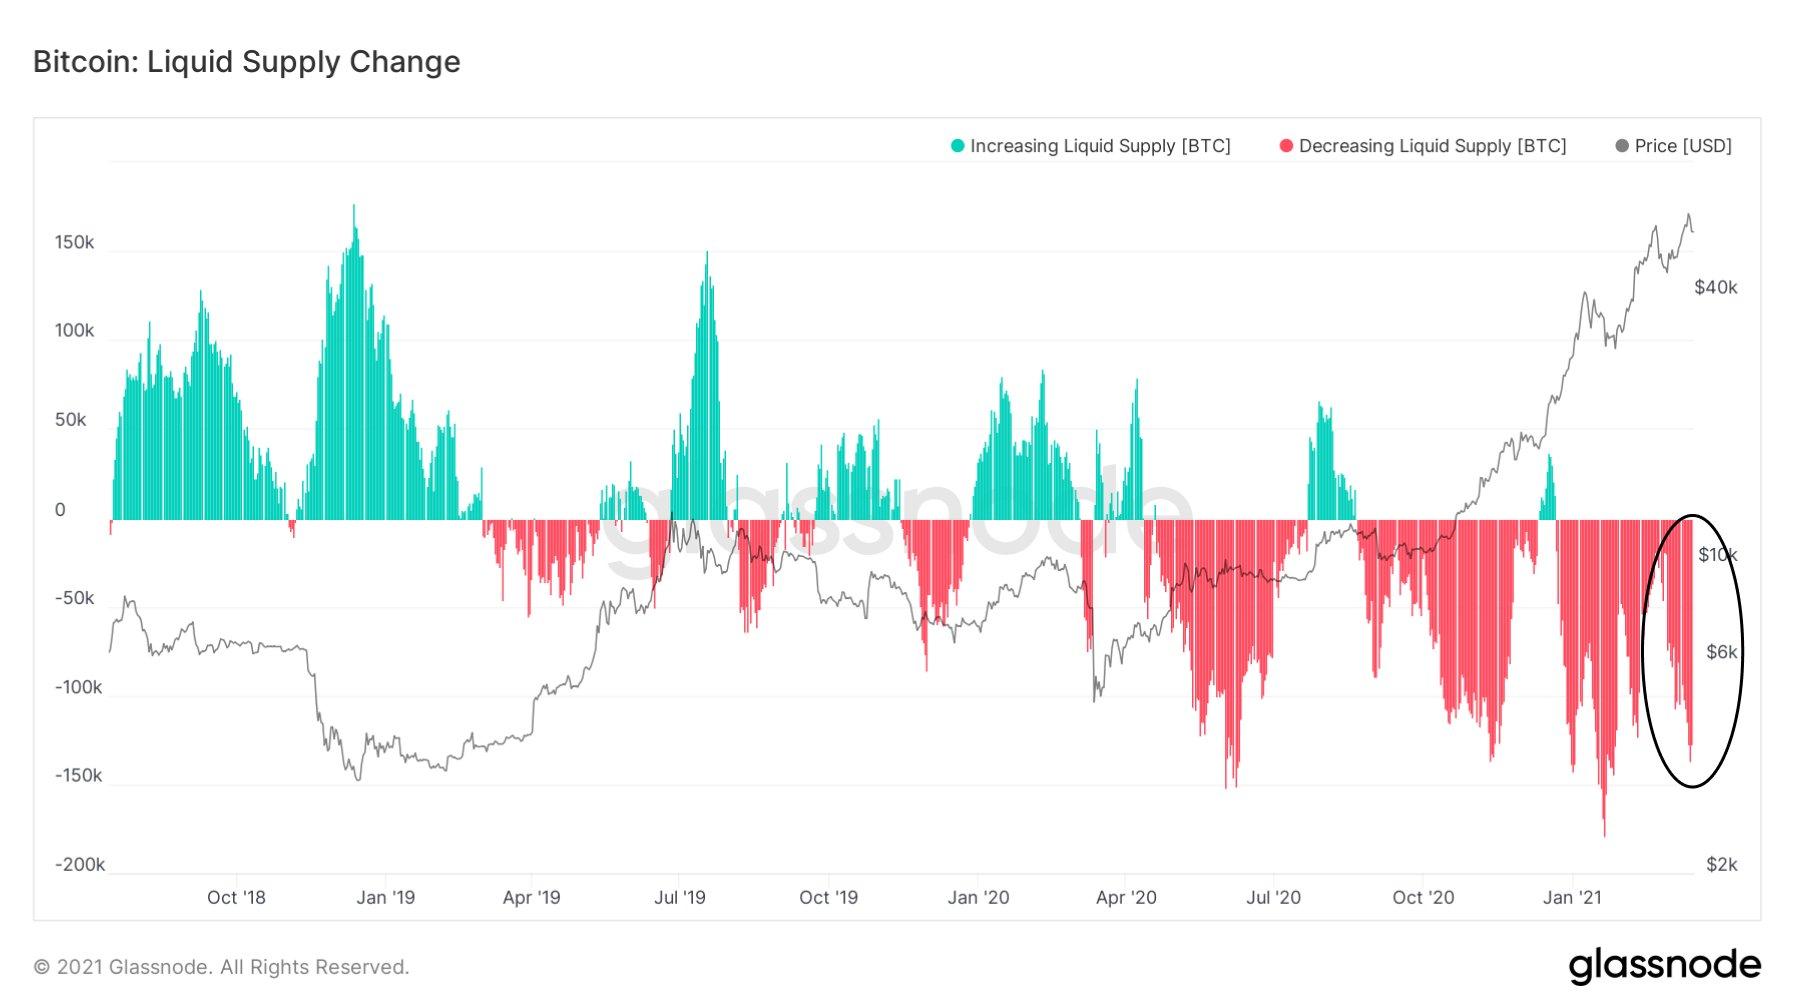 Queda na oferta líquida de Bitcoins no mercado. Fonte: Glassnode.